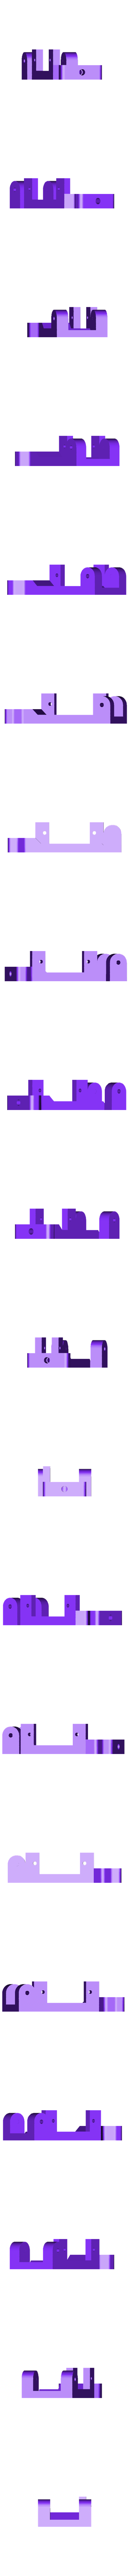 02._VERTICAL_ARM_gb_v1.stl Download free STL file ZDV SPHERE-O-BOT (light remix) • Object to 3D print, jurekkb